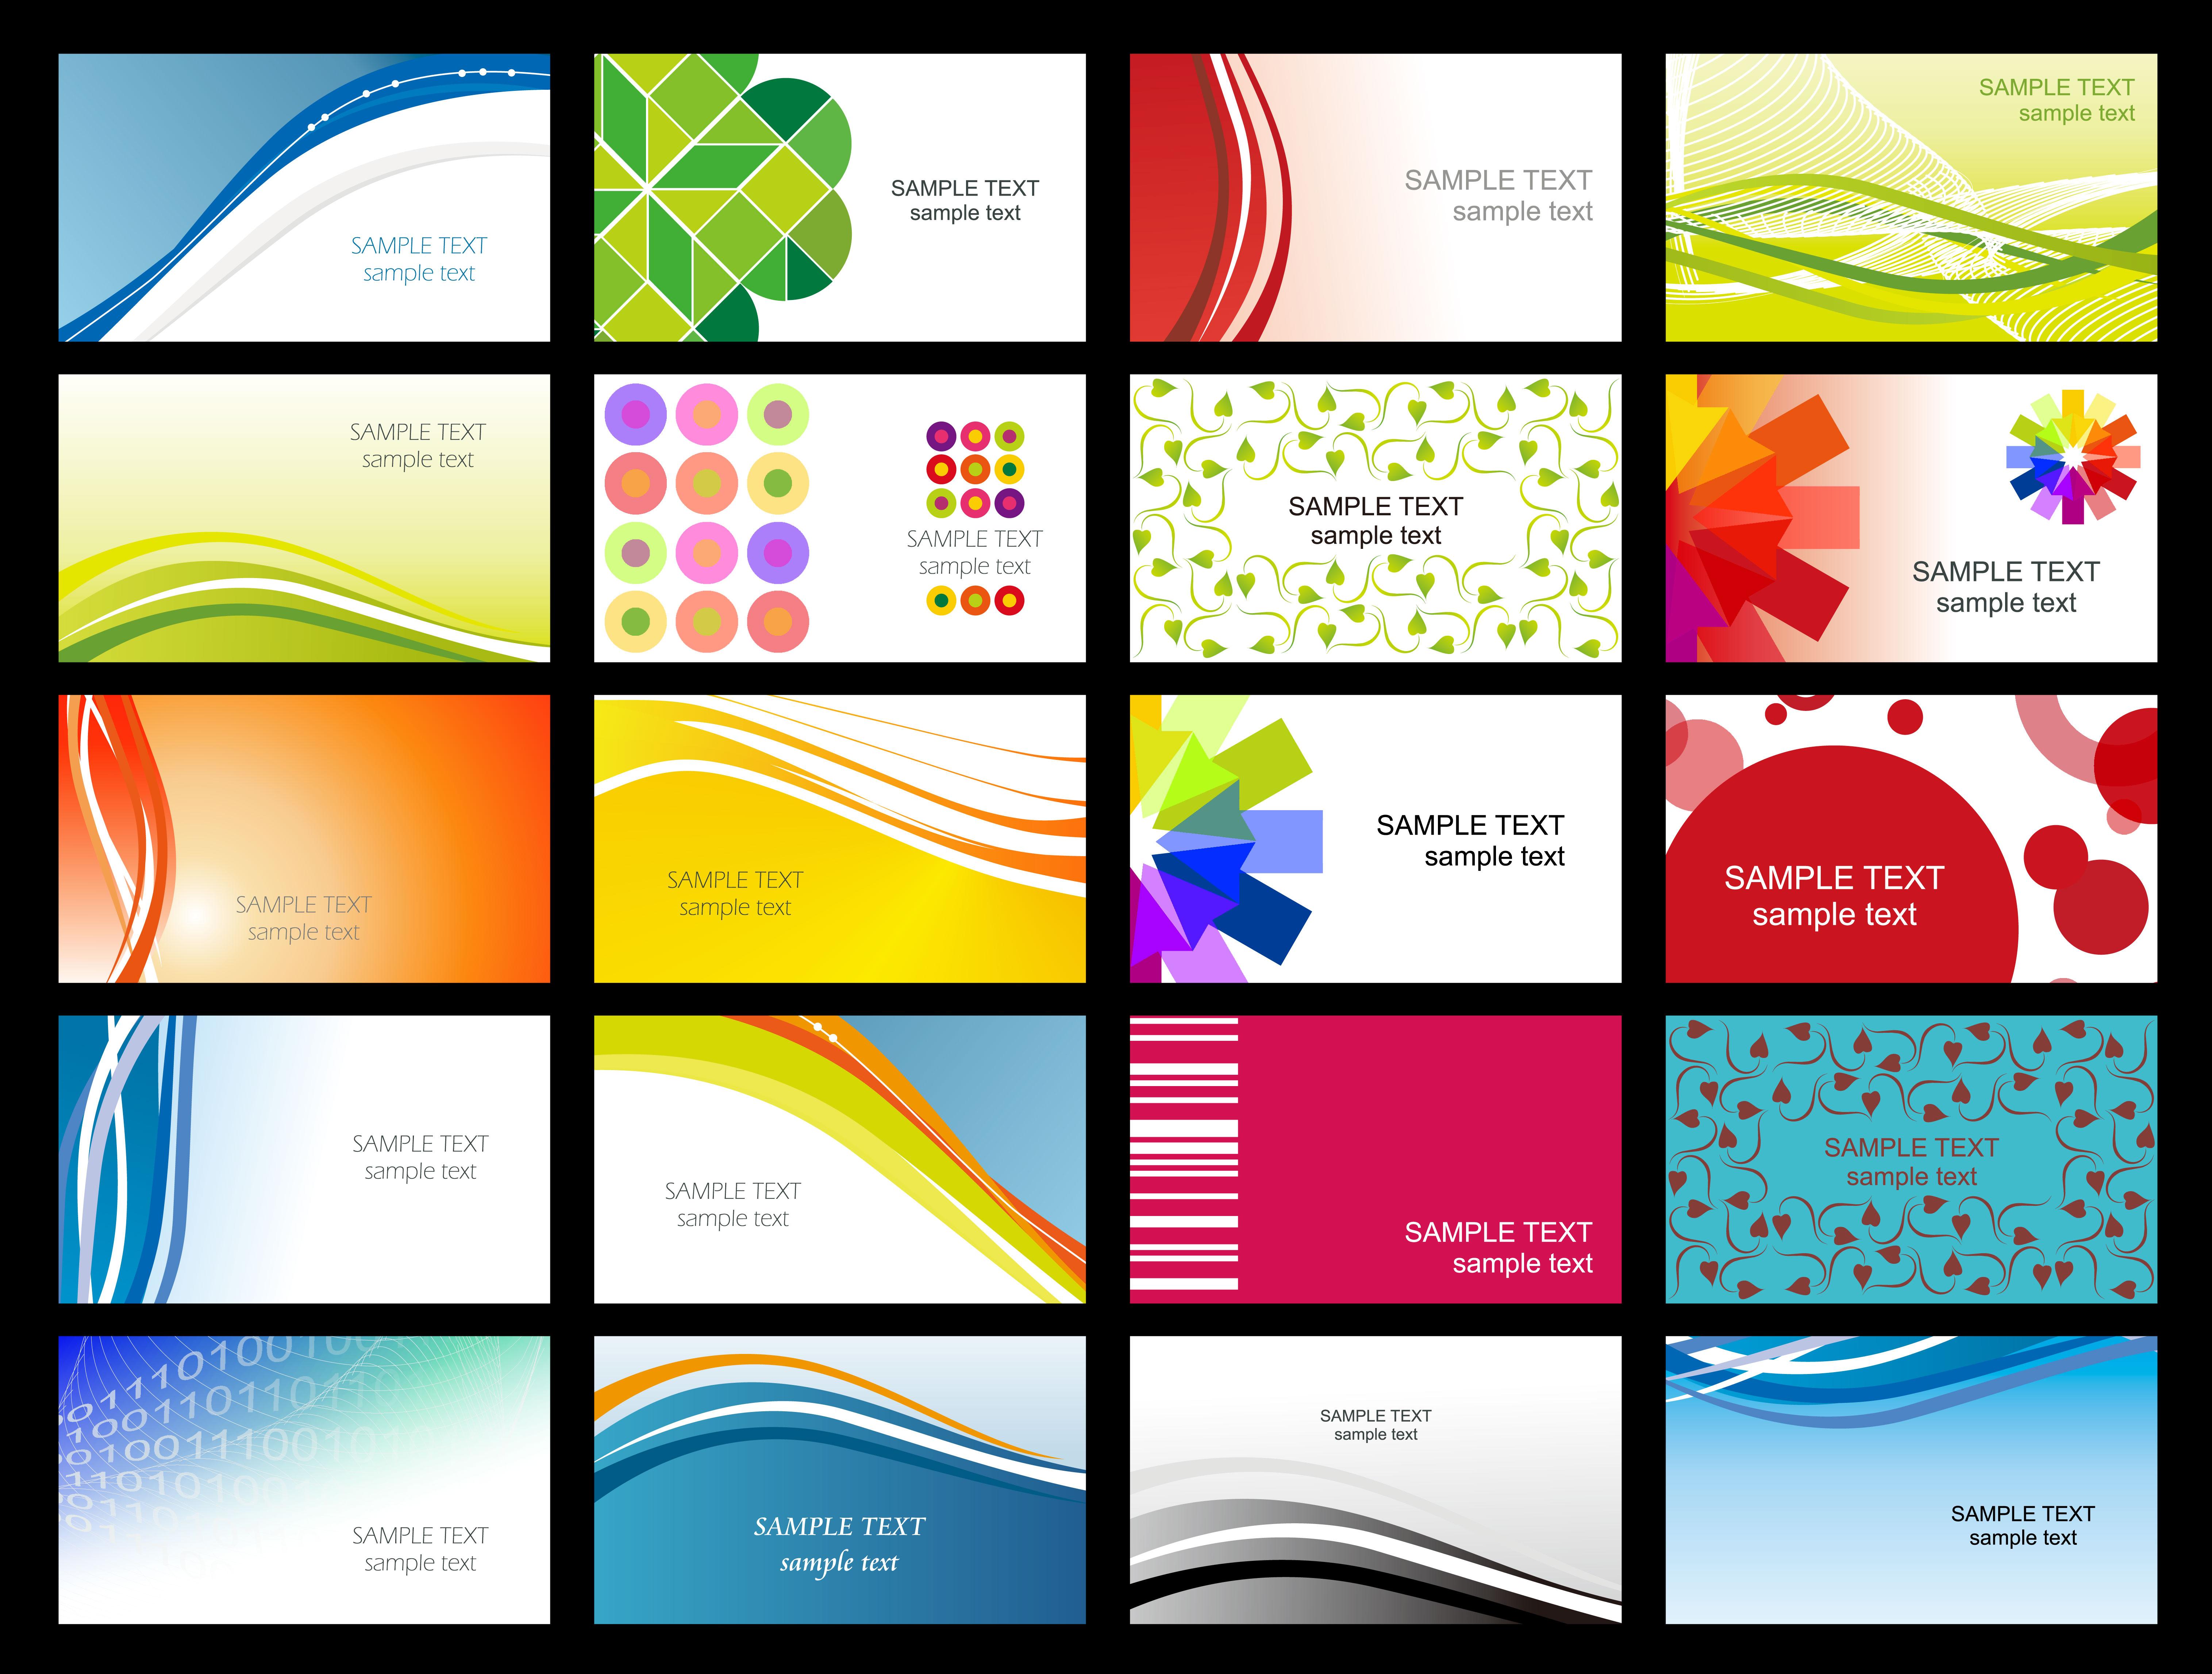 Free Printable Business Card Templates Fresh Free Printable Business - Free Printable Business Card Templates